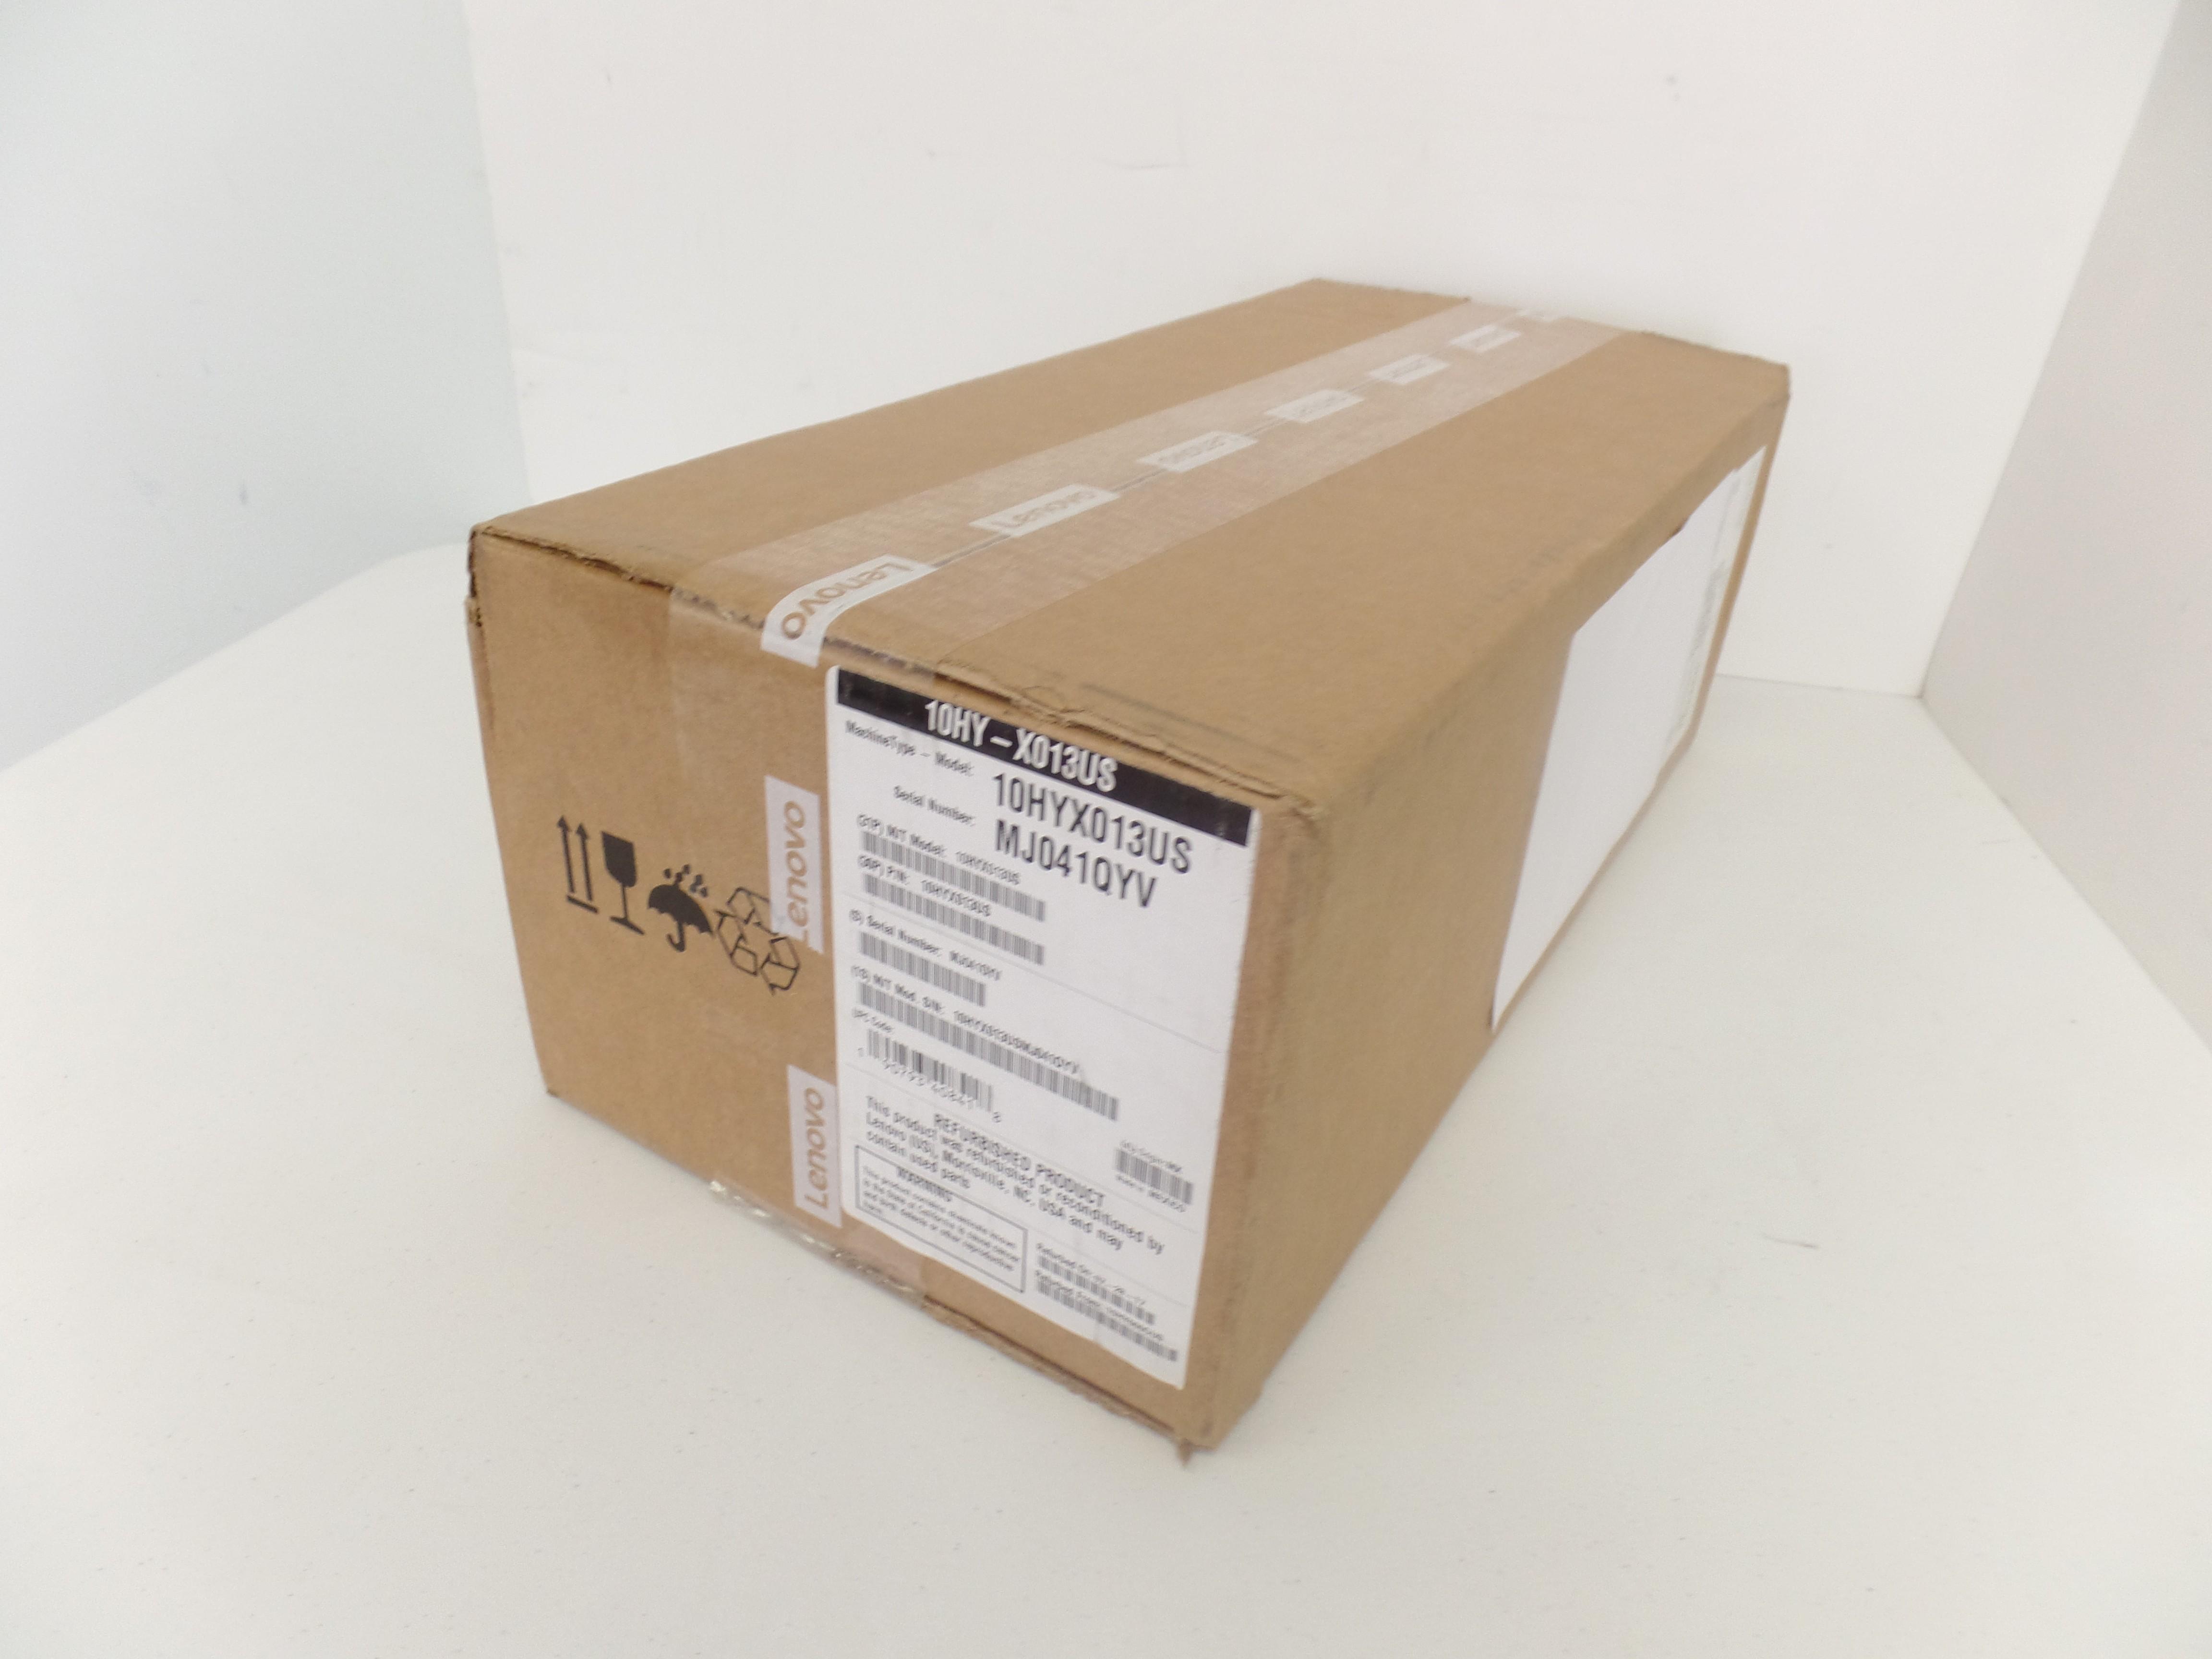 Lenovo ThinkCentre M700 Tiny Desktop i5-6400T 4GB 500GB W10P 10HYX013US R